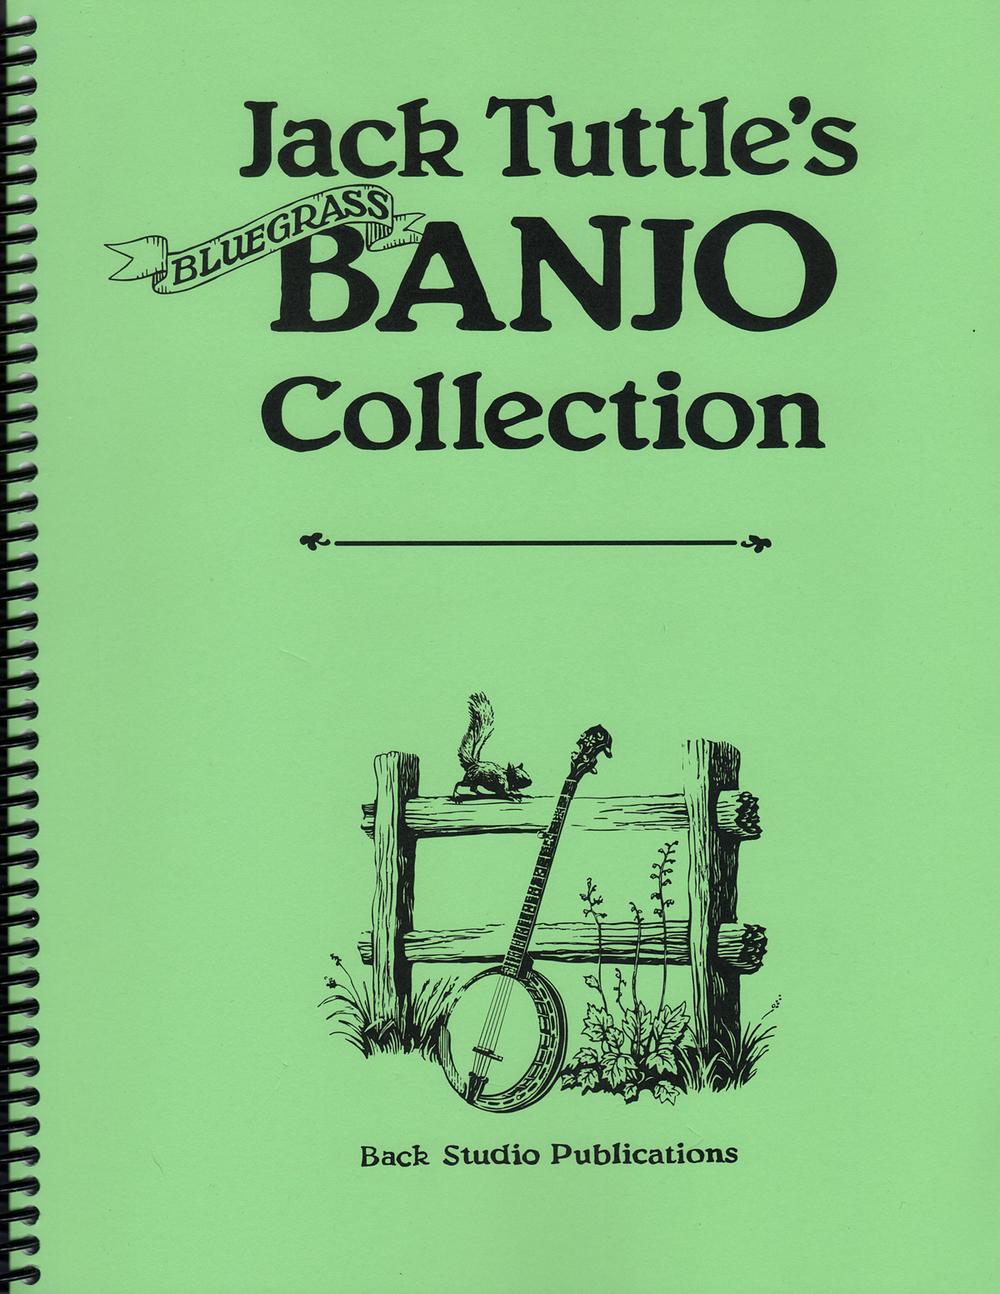 Jack Tuttle's Bluegrass Banjo Collection, Vol. 2